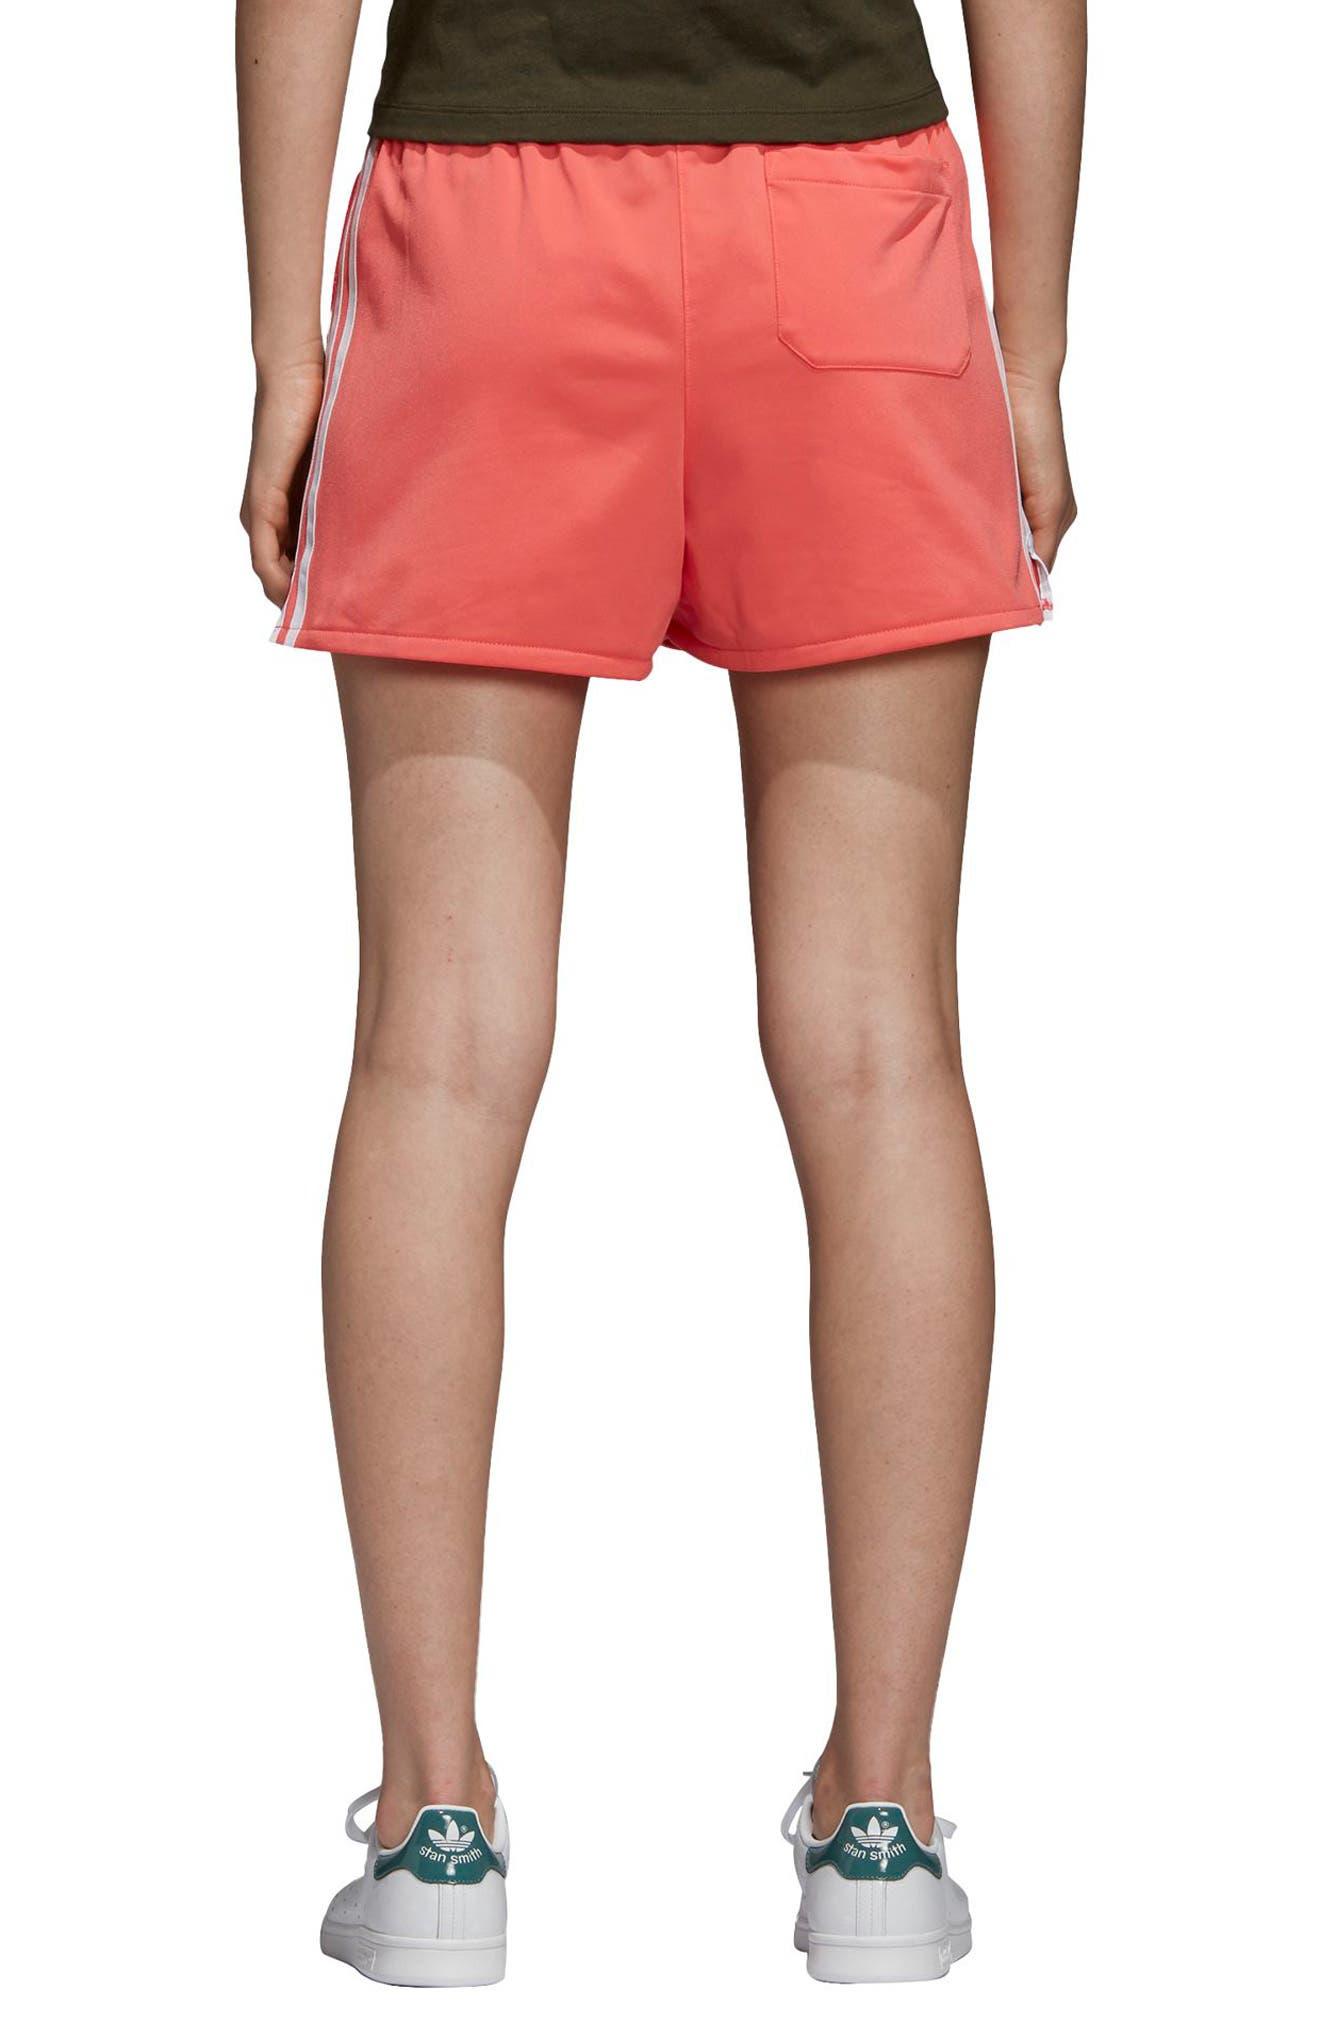 ADIDAS ORIGINALS,                             3-Stripes Shorts,                             Alternate thumbnail 2, color,                             600